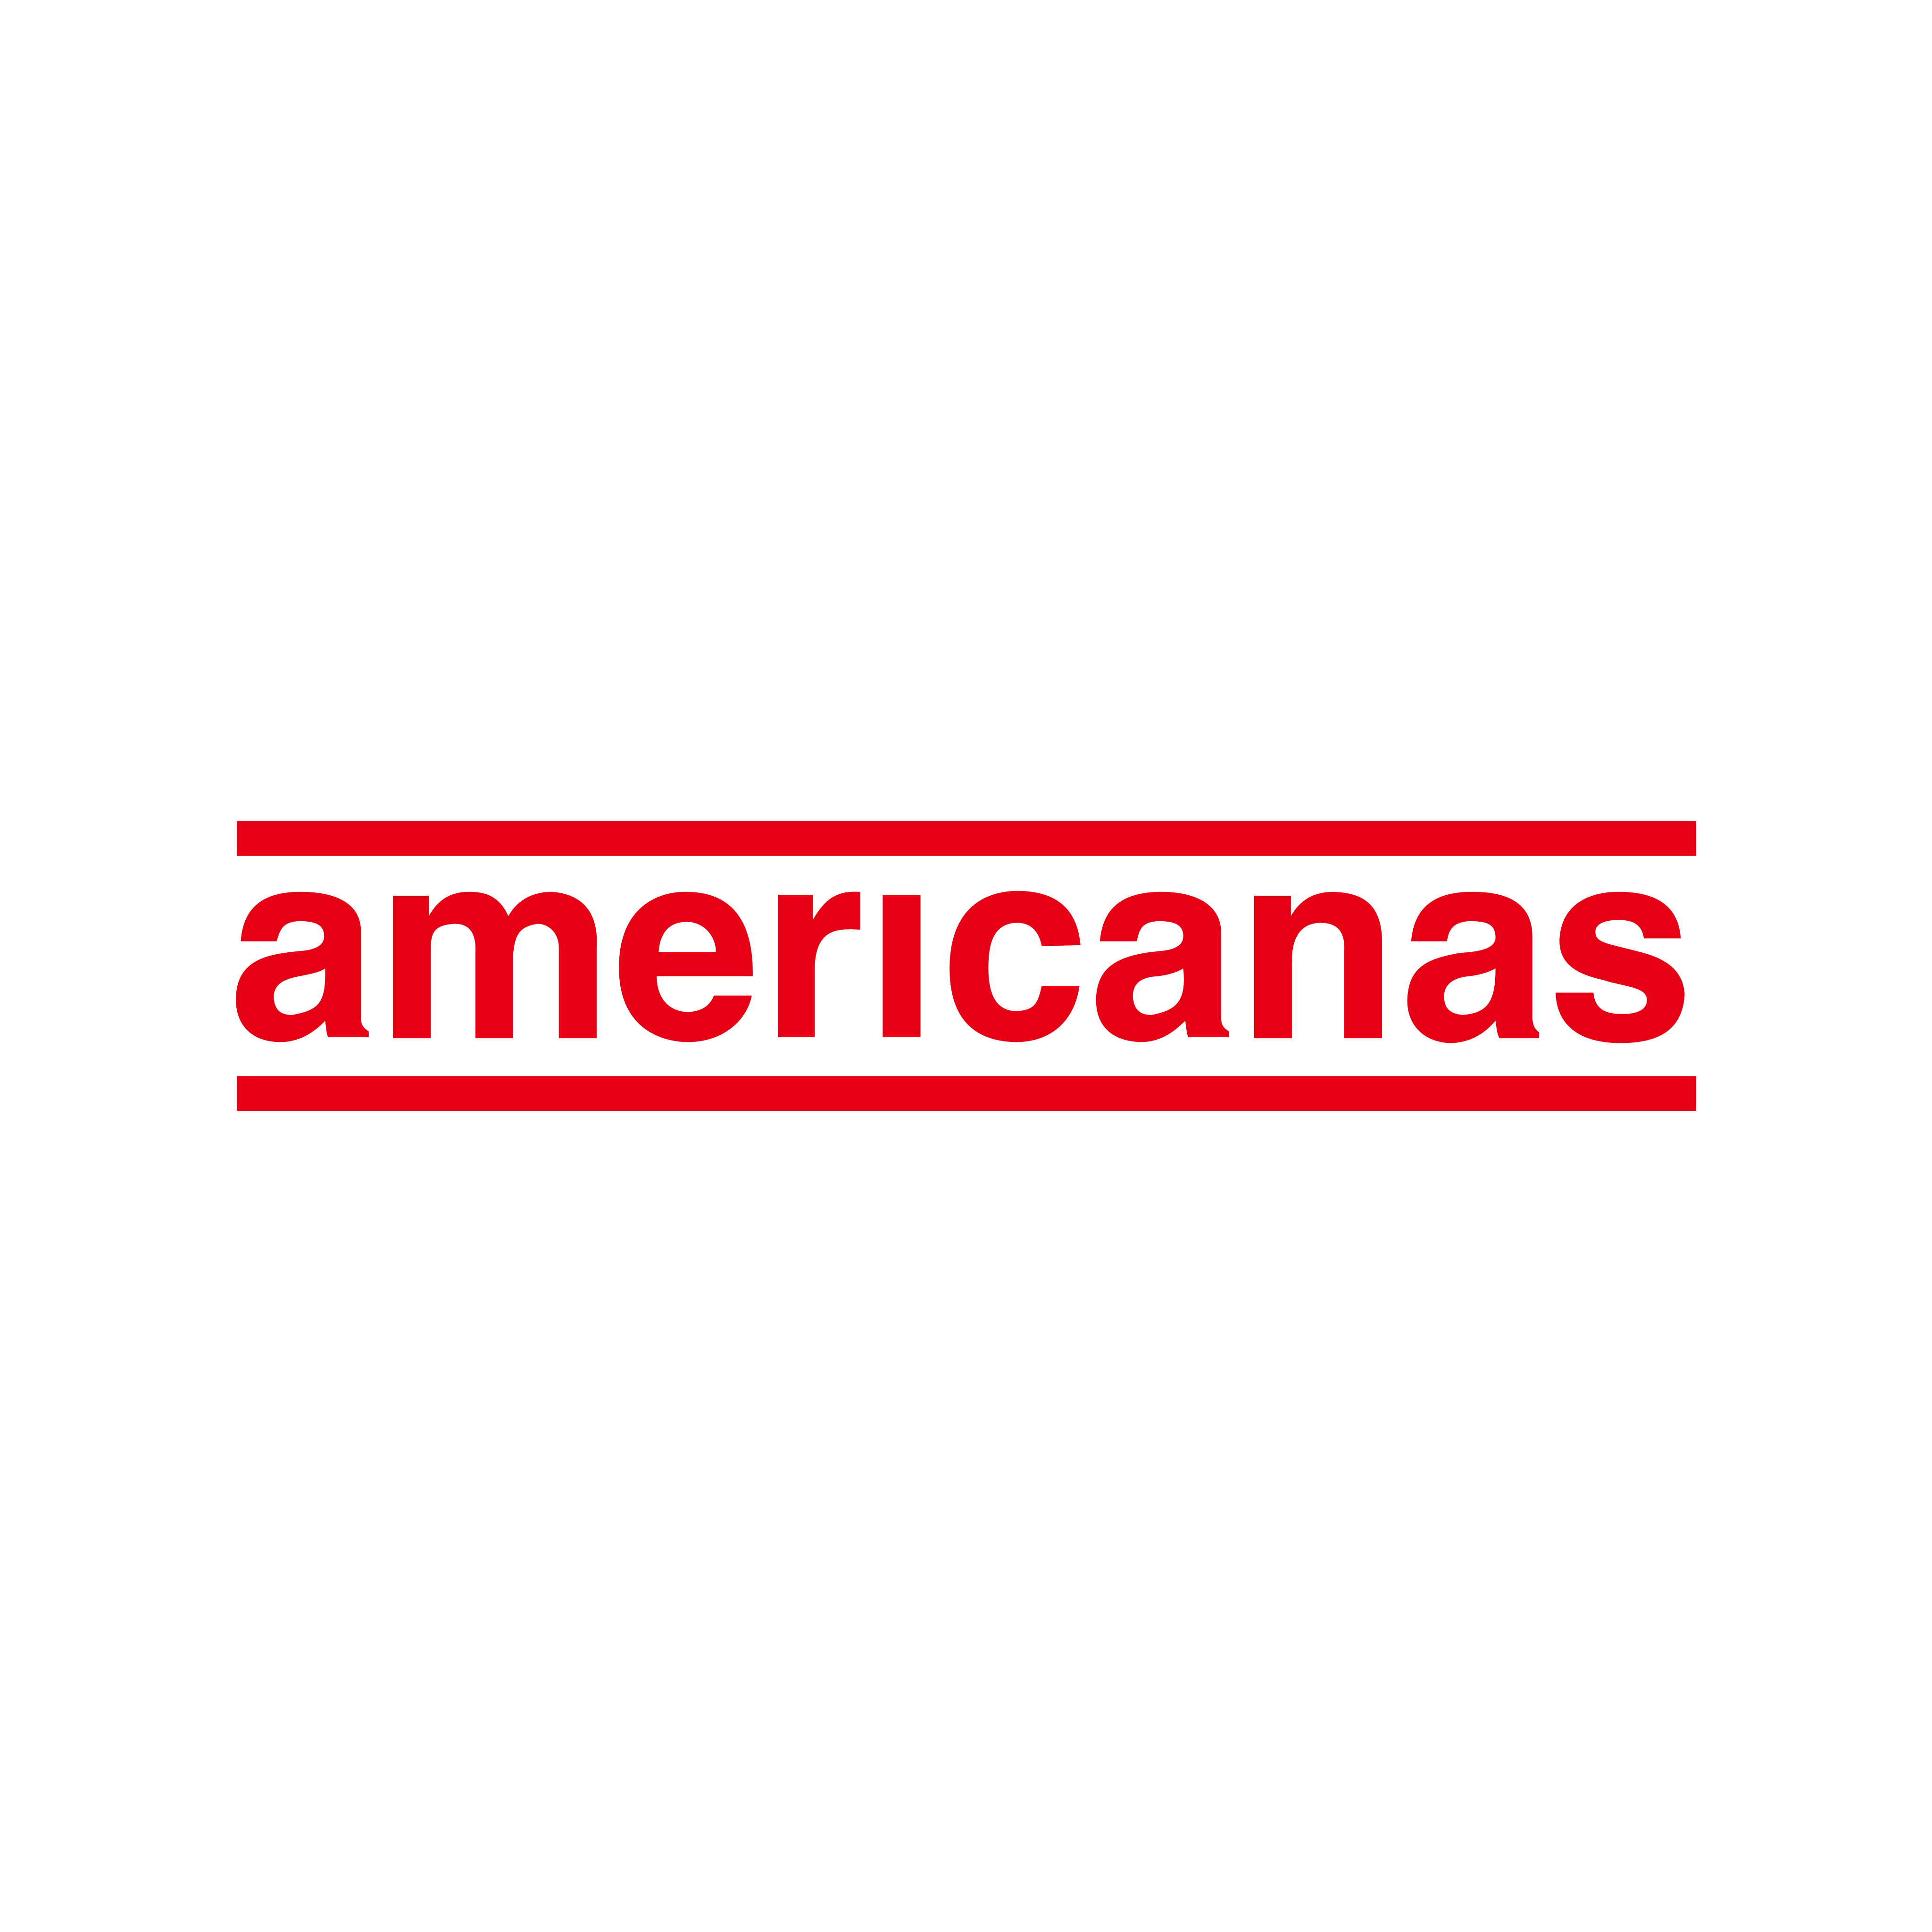 americanas logo 0 - Americanas Logo